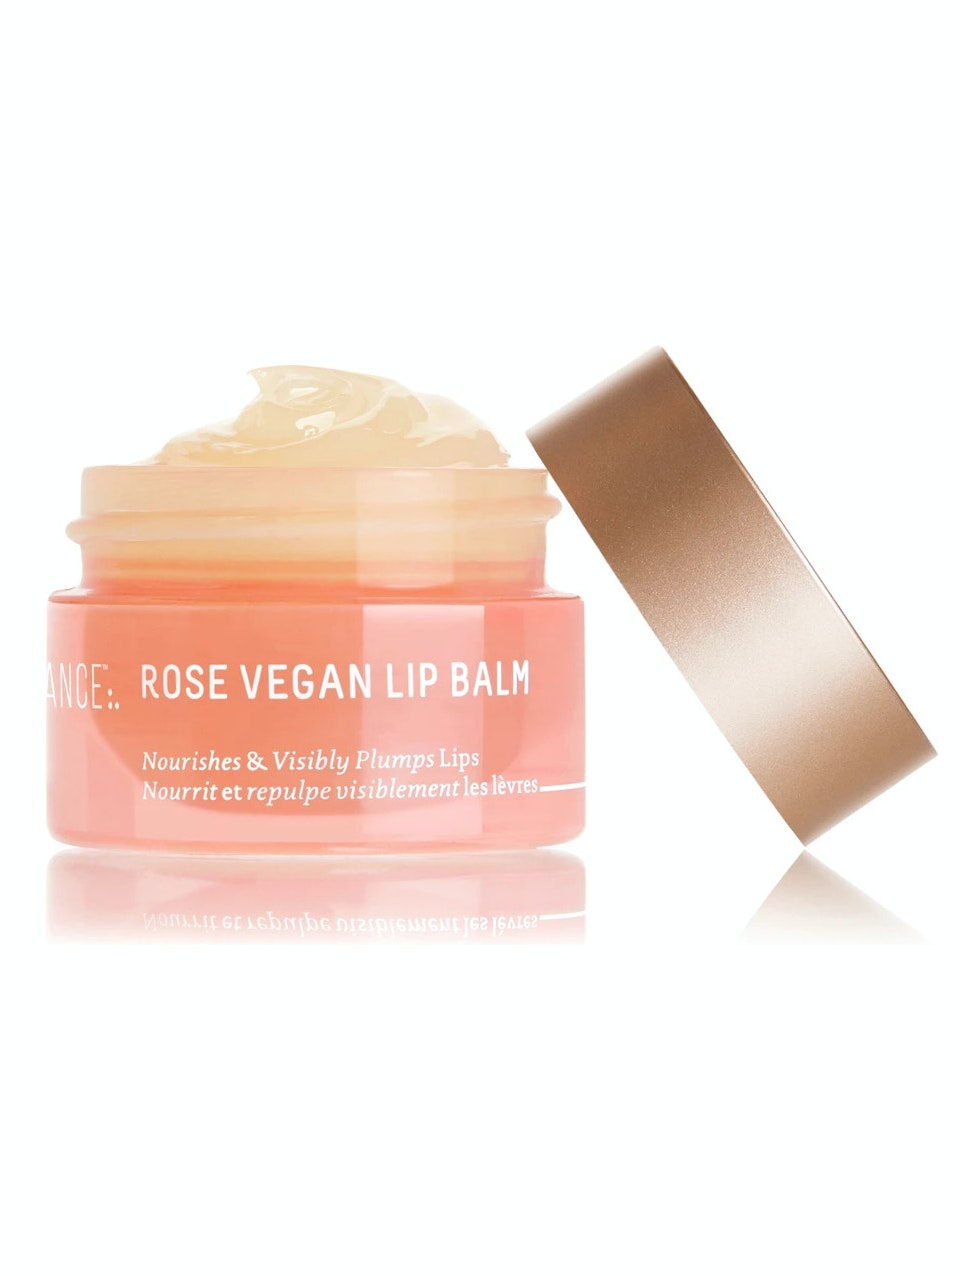 Biossance Squalane + Rose Vegan Lip Balm